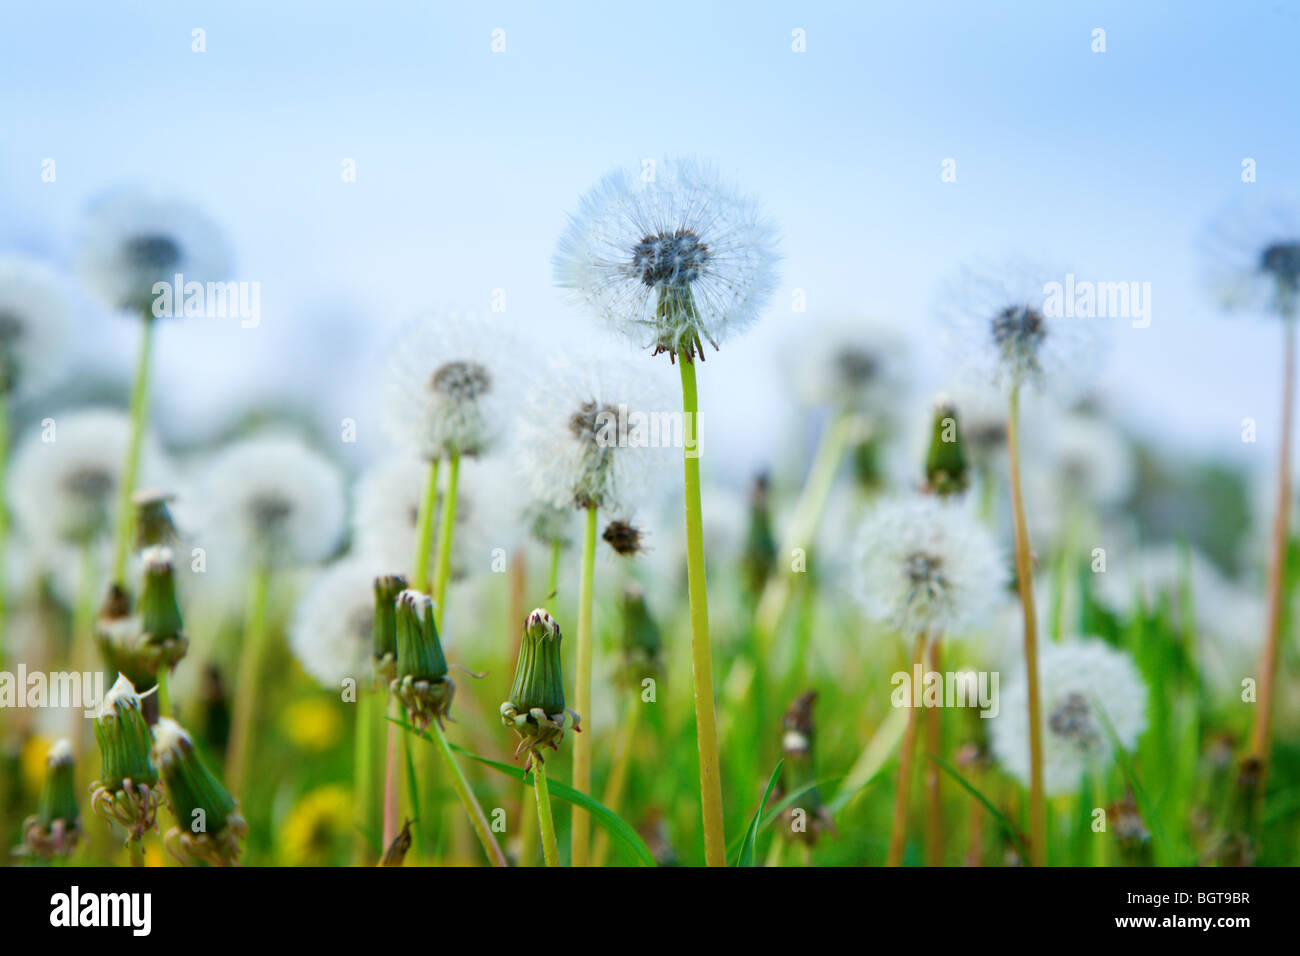 Dandelions - Stock Image